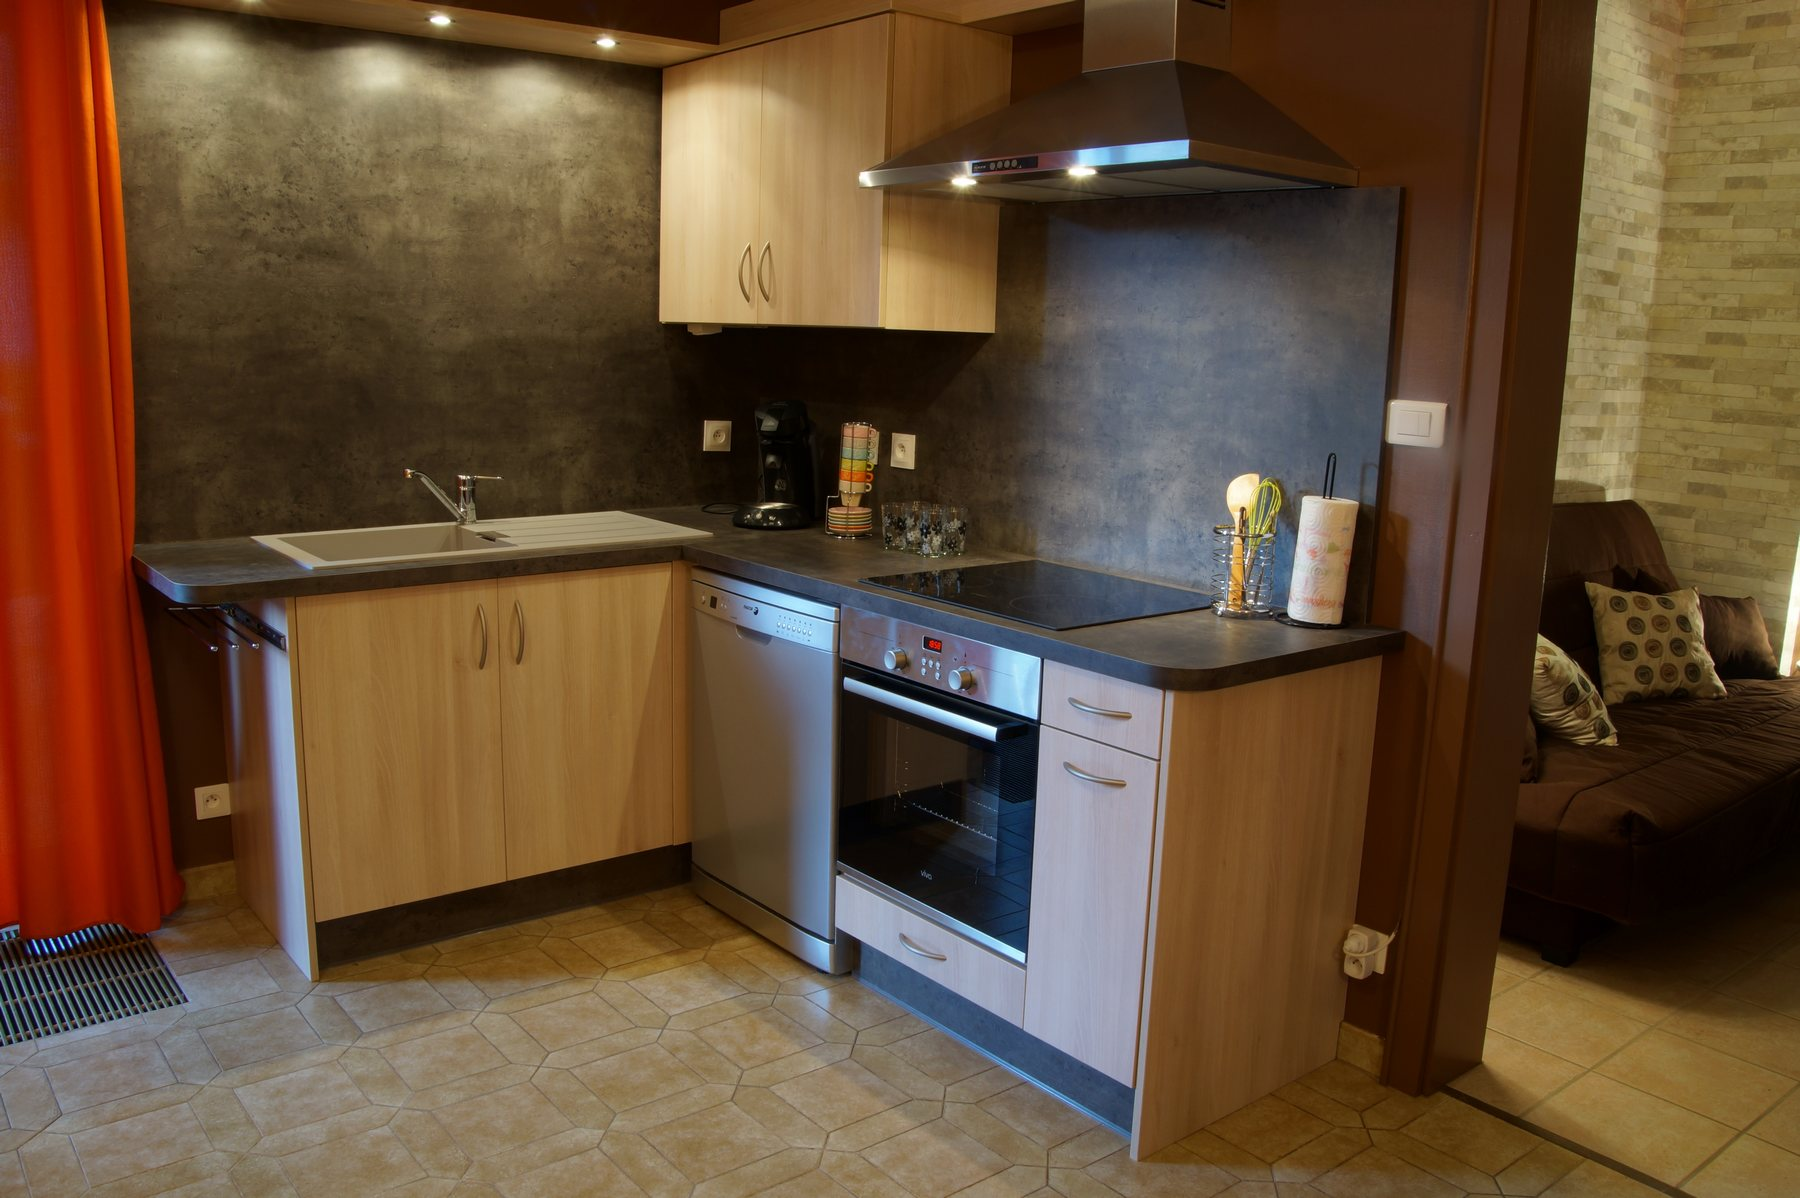 ferienwohnung m koffel nenette en alsace 67600 selestat ferienwohnungen selestat. Black Bedroom Furniture Sets. Home Design Ideas